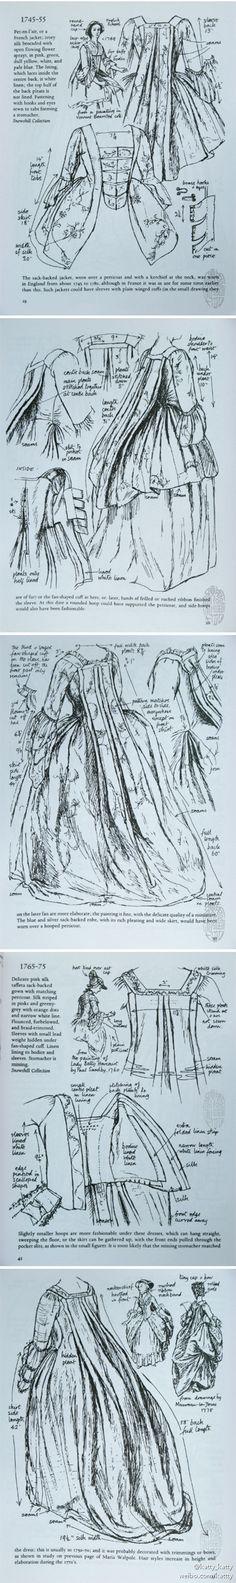 Costume Detail 1750s-1770s drawings from Nancy Bradfield's book Costume in Detail 1730-1930 Click here: https://books.google.com.au/books/about/Costume_in_detail.html?id=7dTfAAAAMAAJ&redir_esc=y